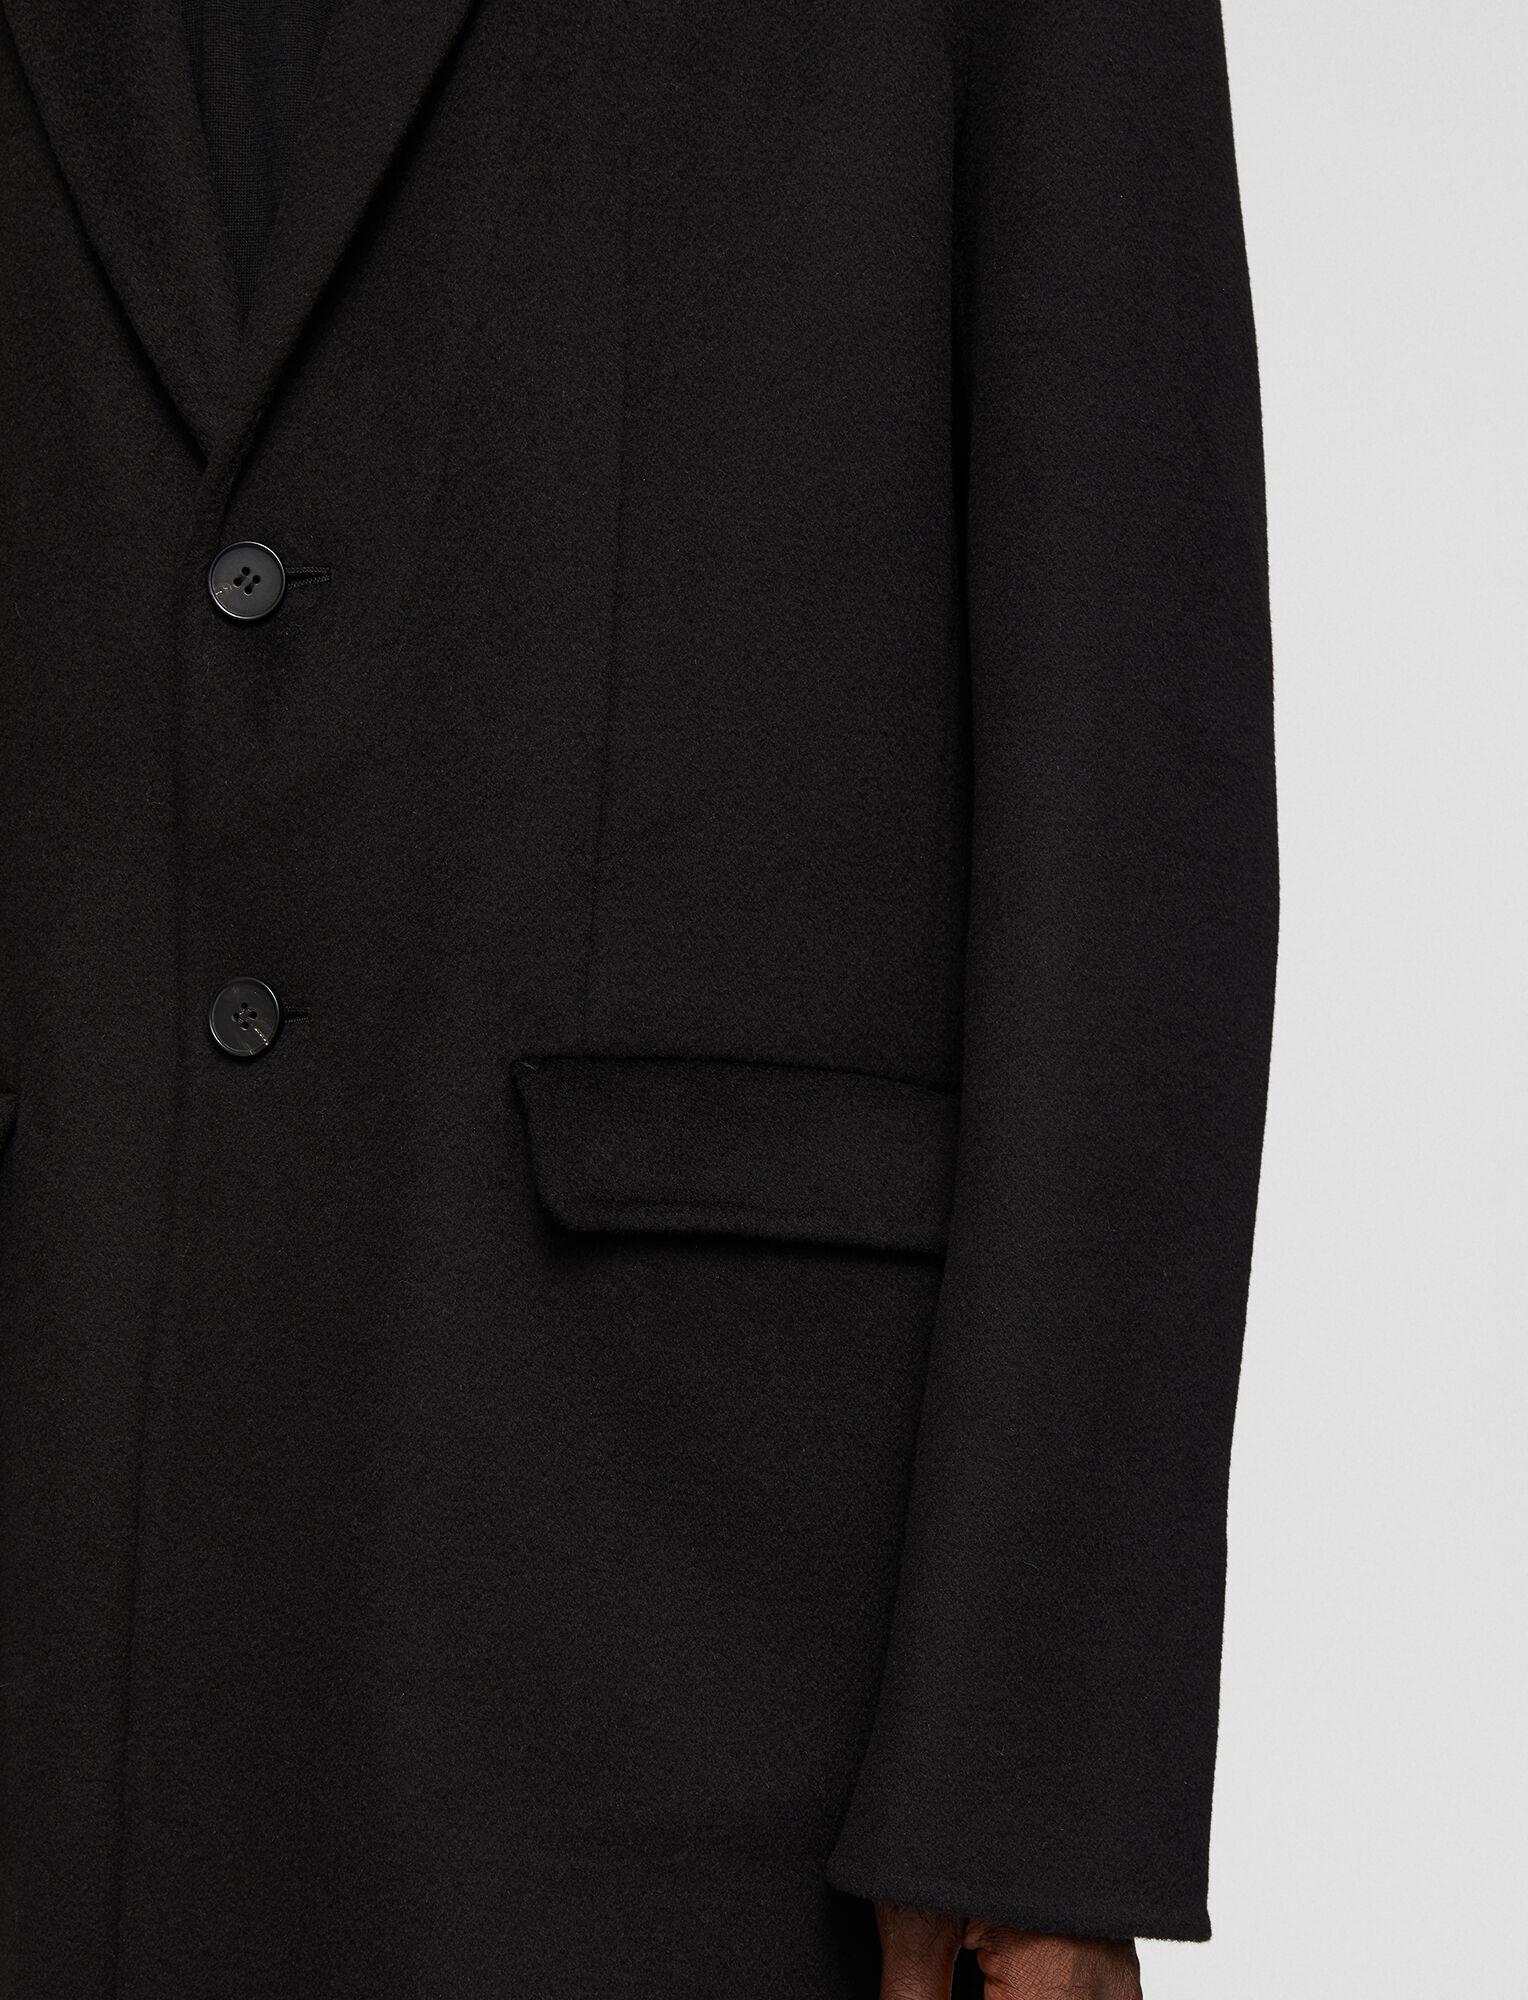 Joseph, Armand Double Face Cashmere Coat, in BLACK